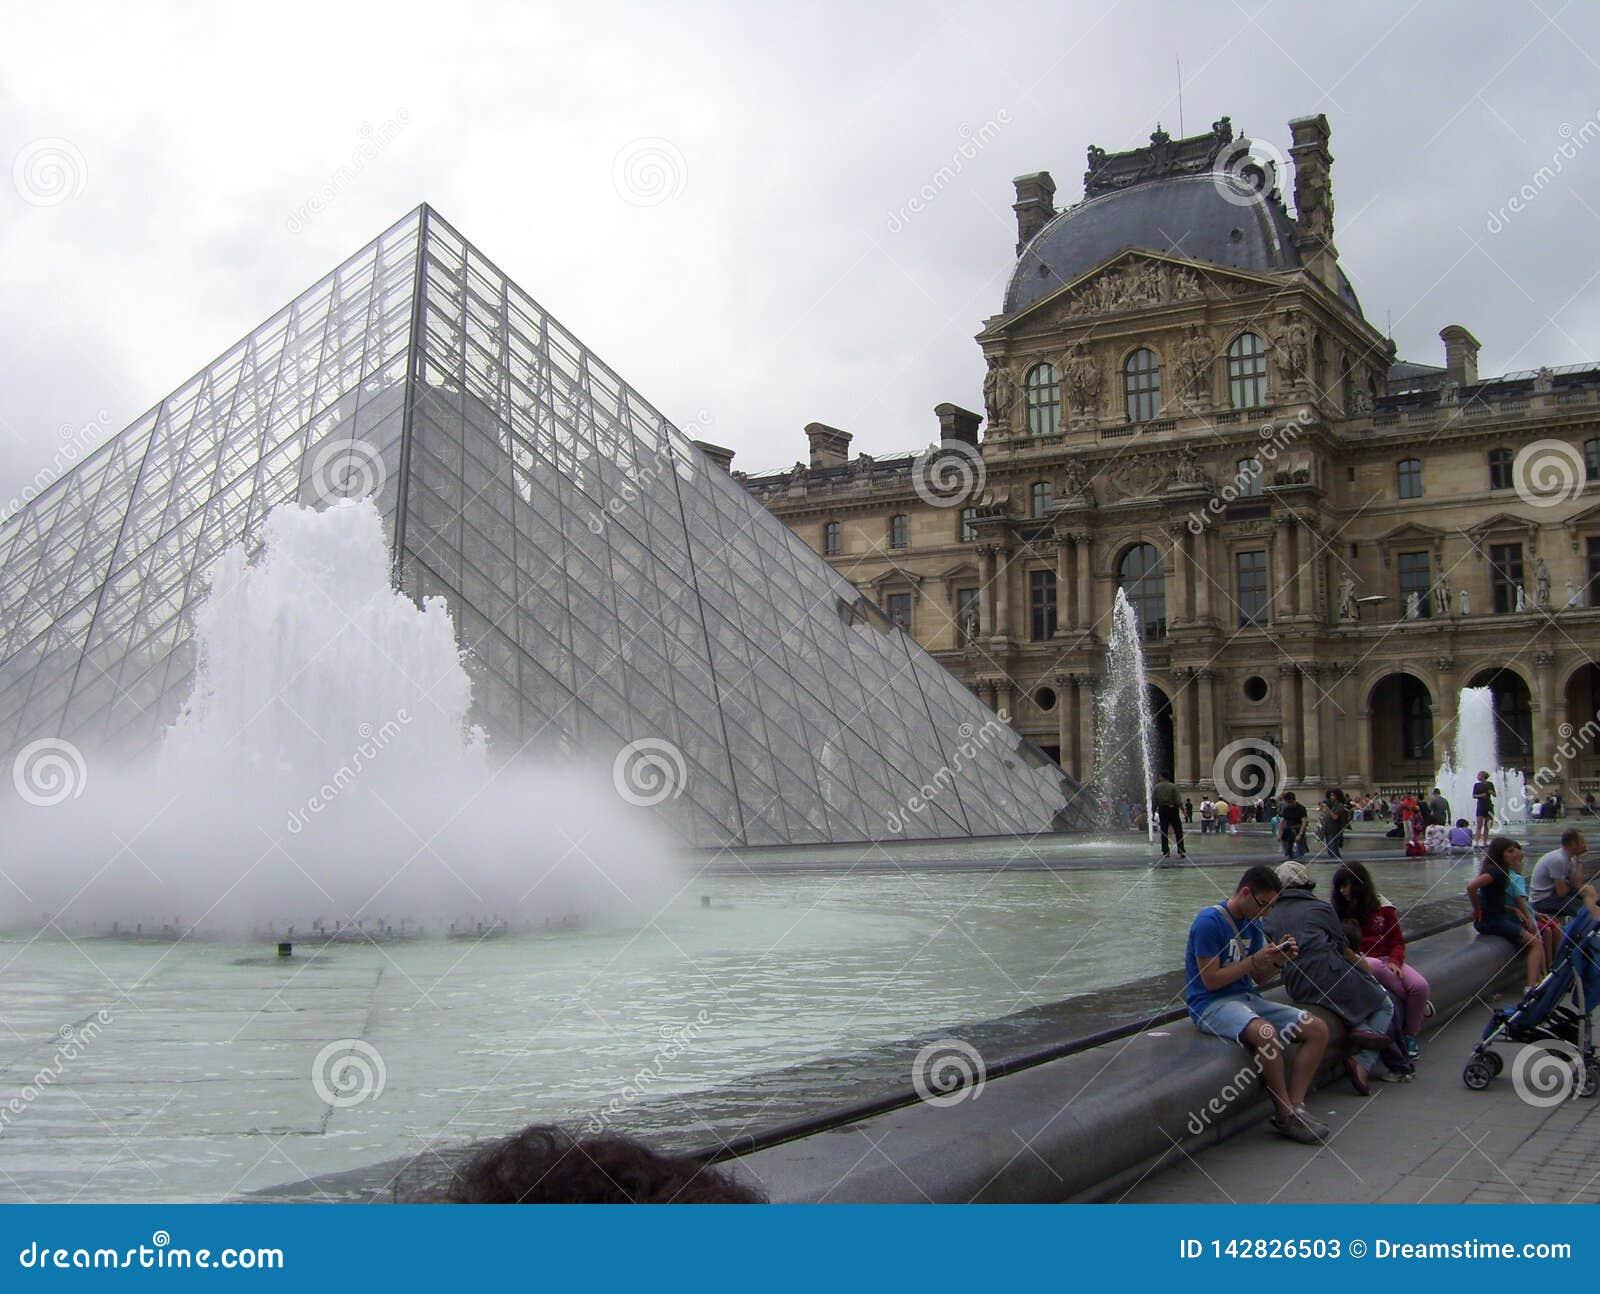 Louvremuseet är det viktigaste museet i Frankrike